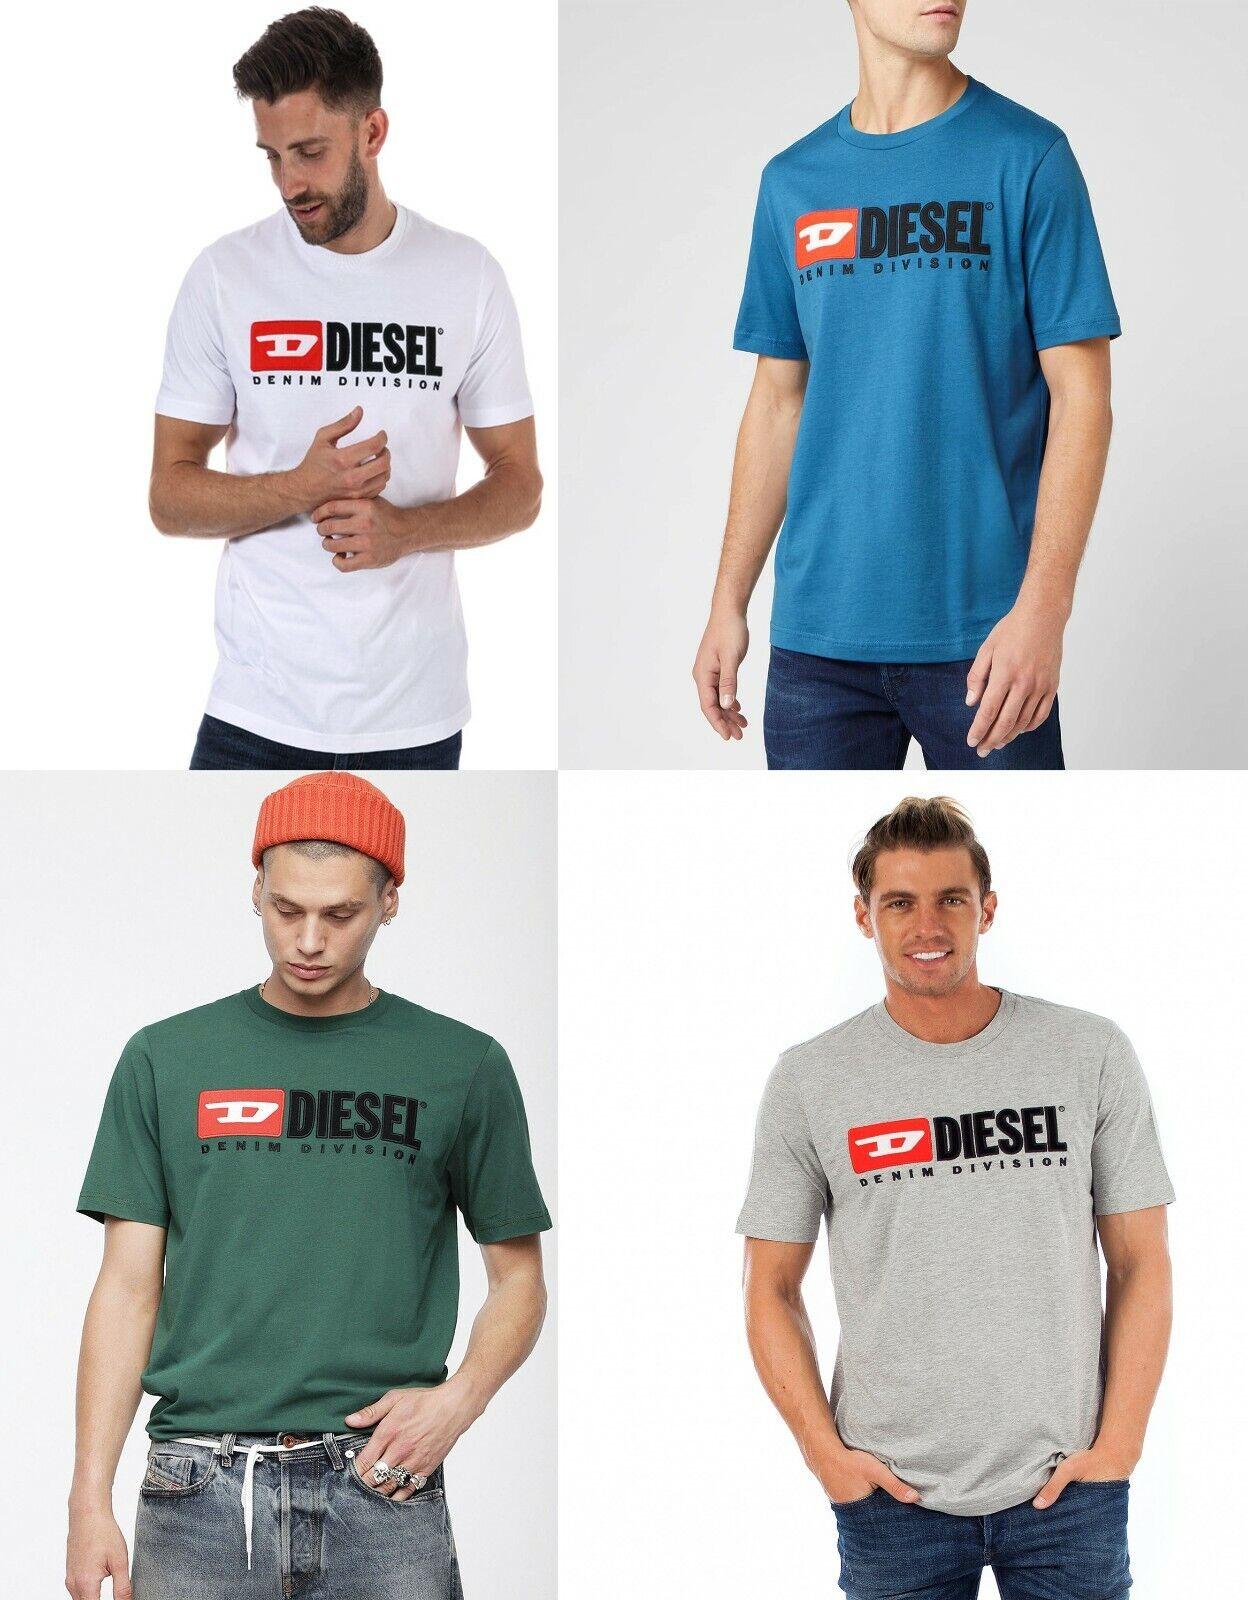 Diesel T Just Division Men Crew Neck Short Sleeves Cotton T shirt Tee S M L XL